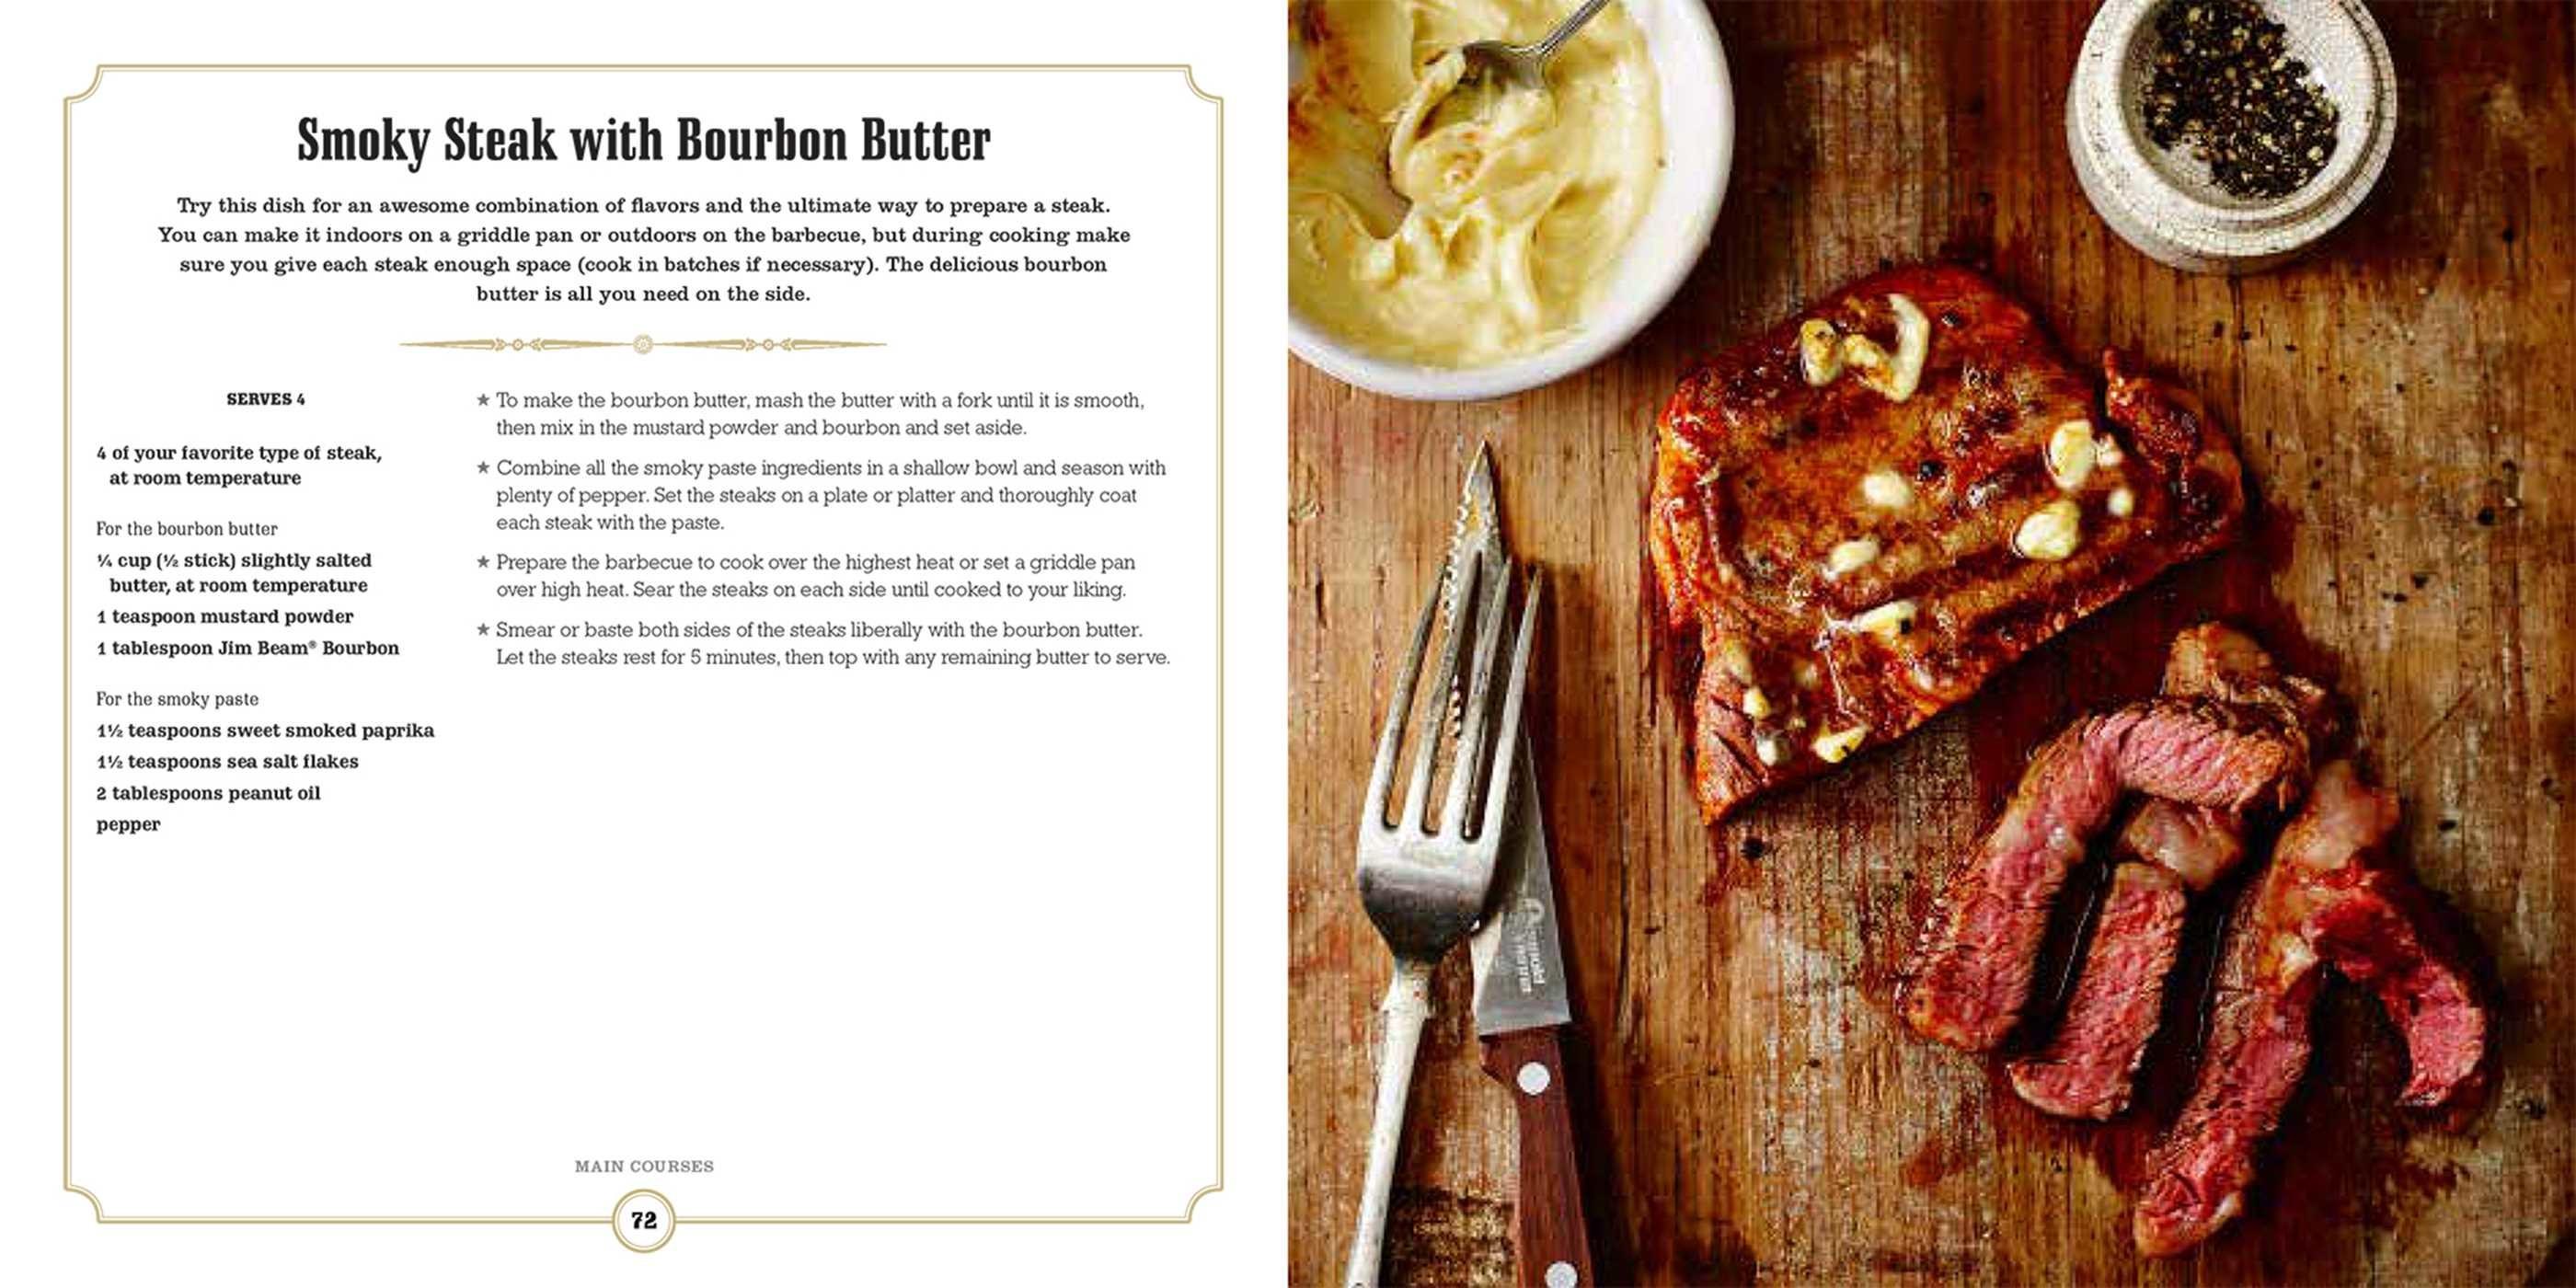 Jim beam bourbon cookbook 9781684120819.in02